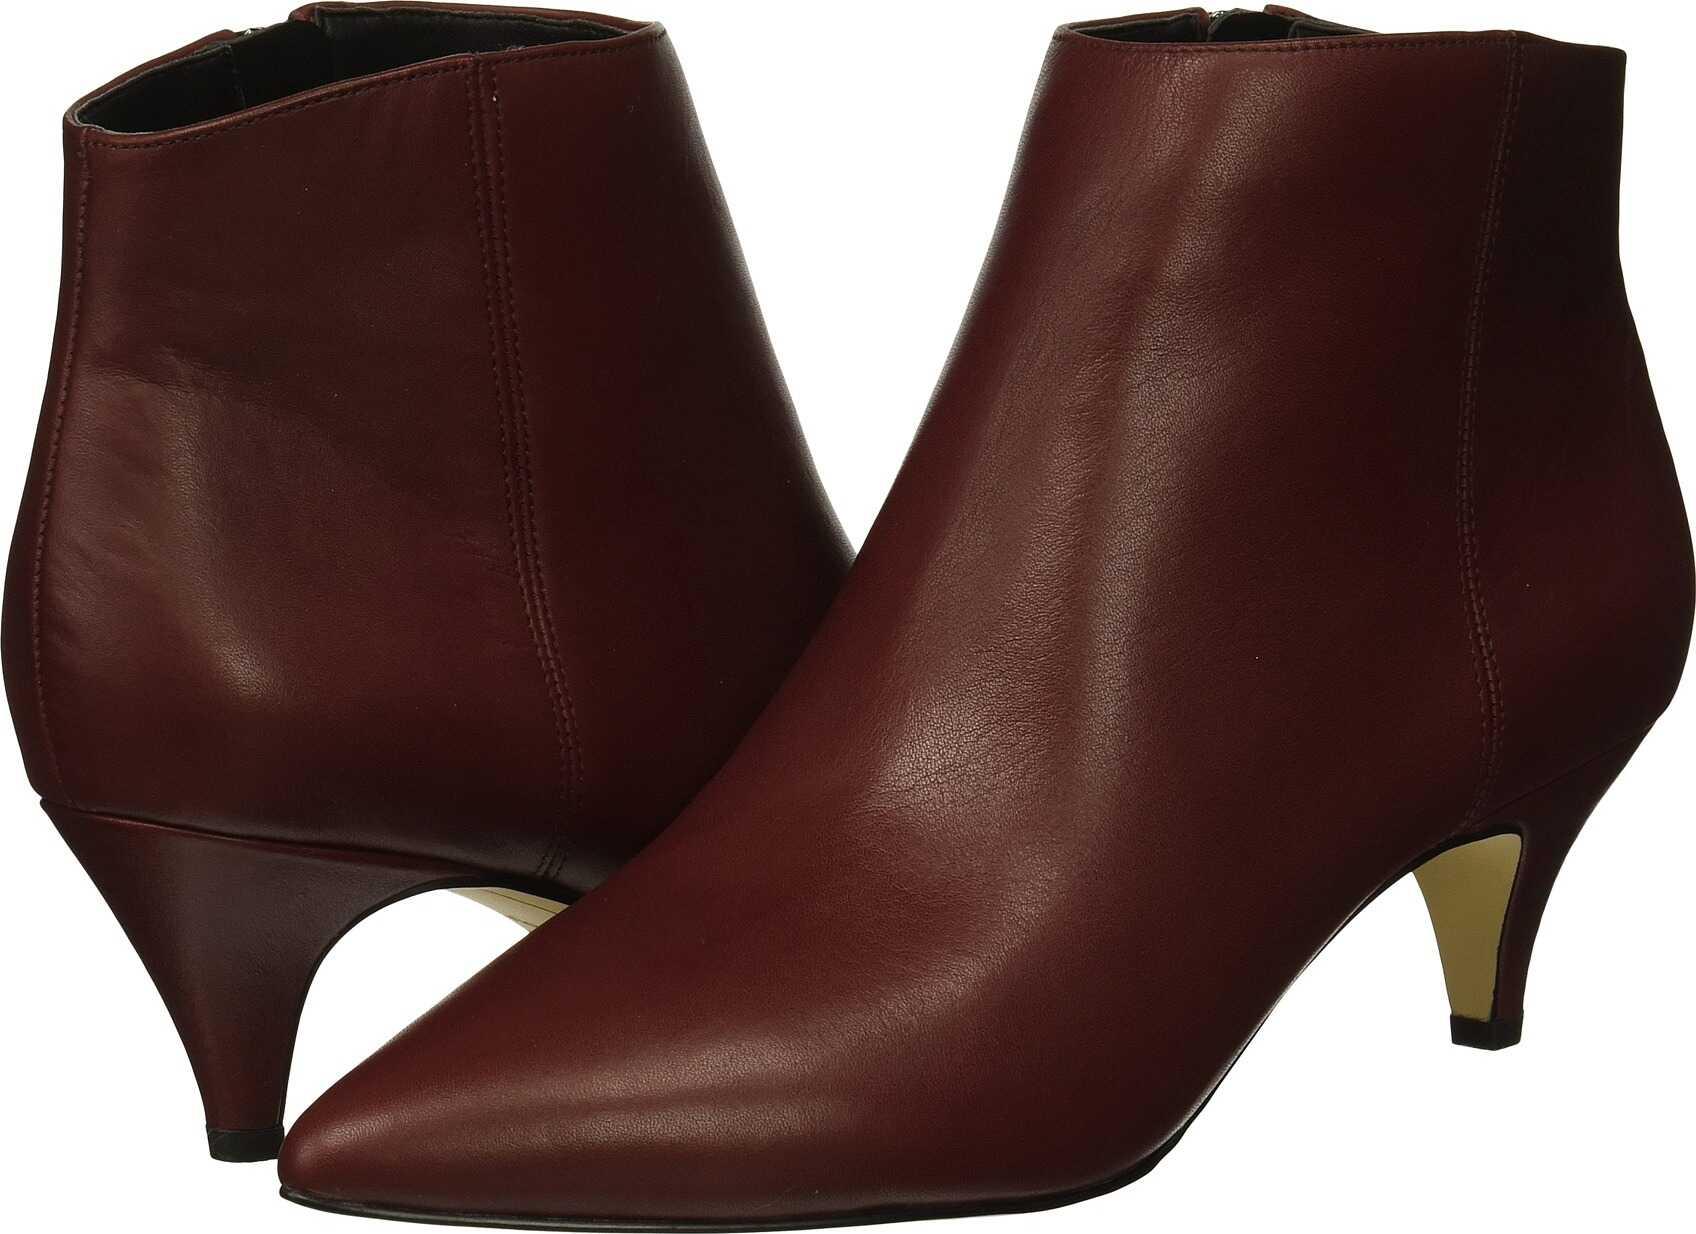 Sam Edelman Kinzey Beet Red Modena Calf Leather/Dakota Nappa